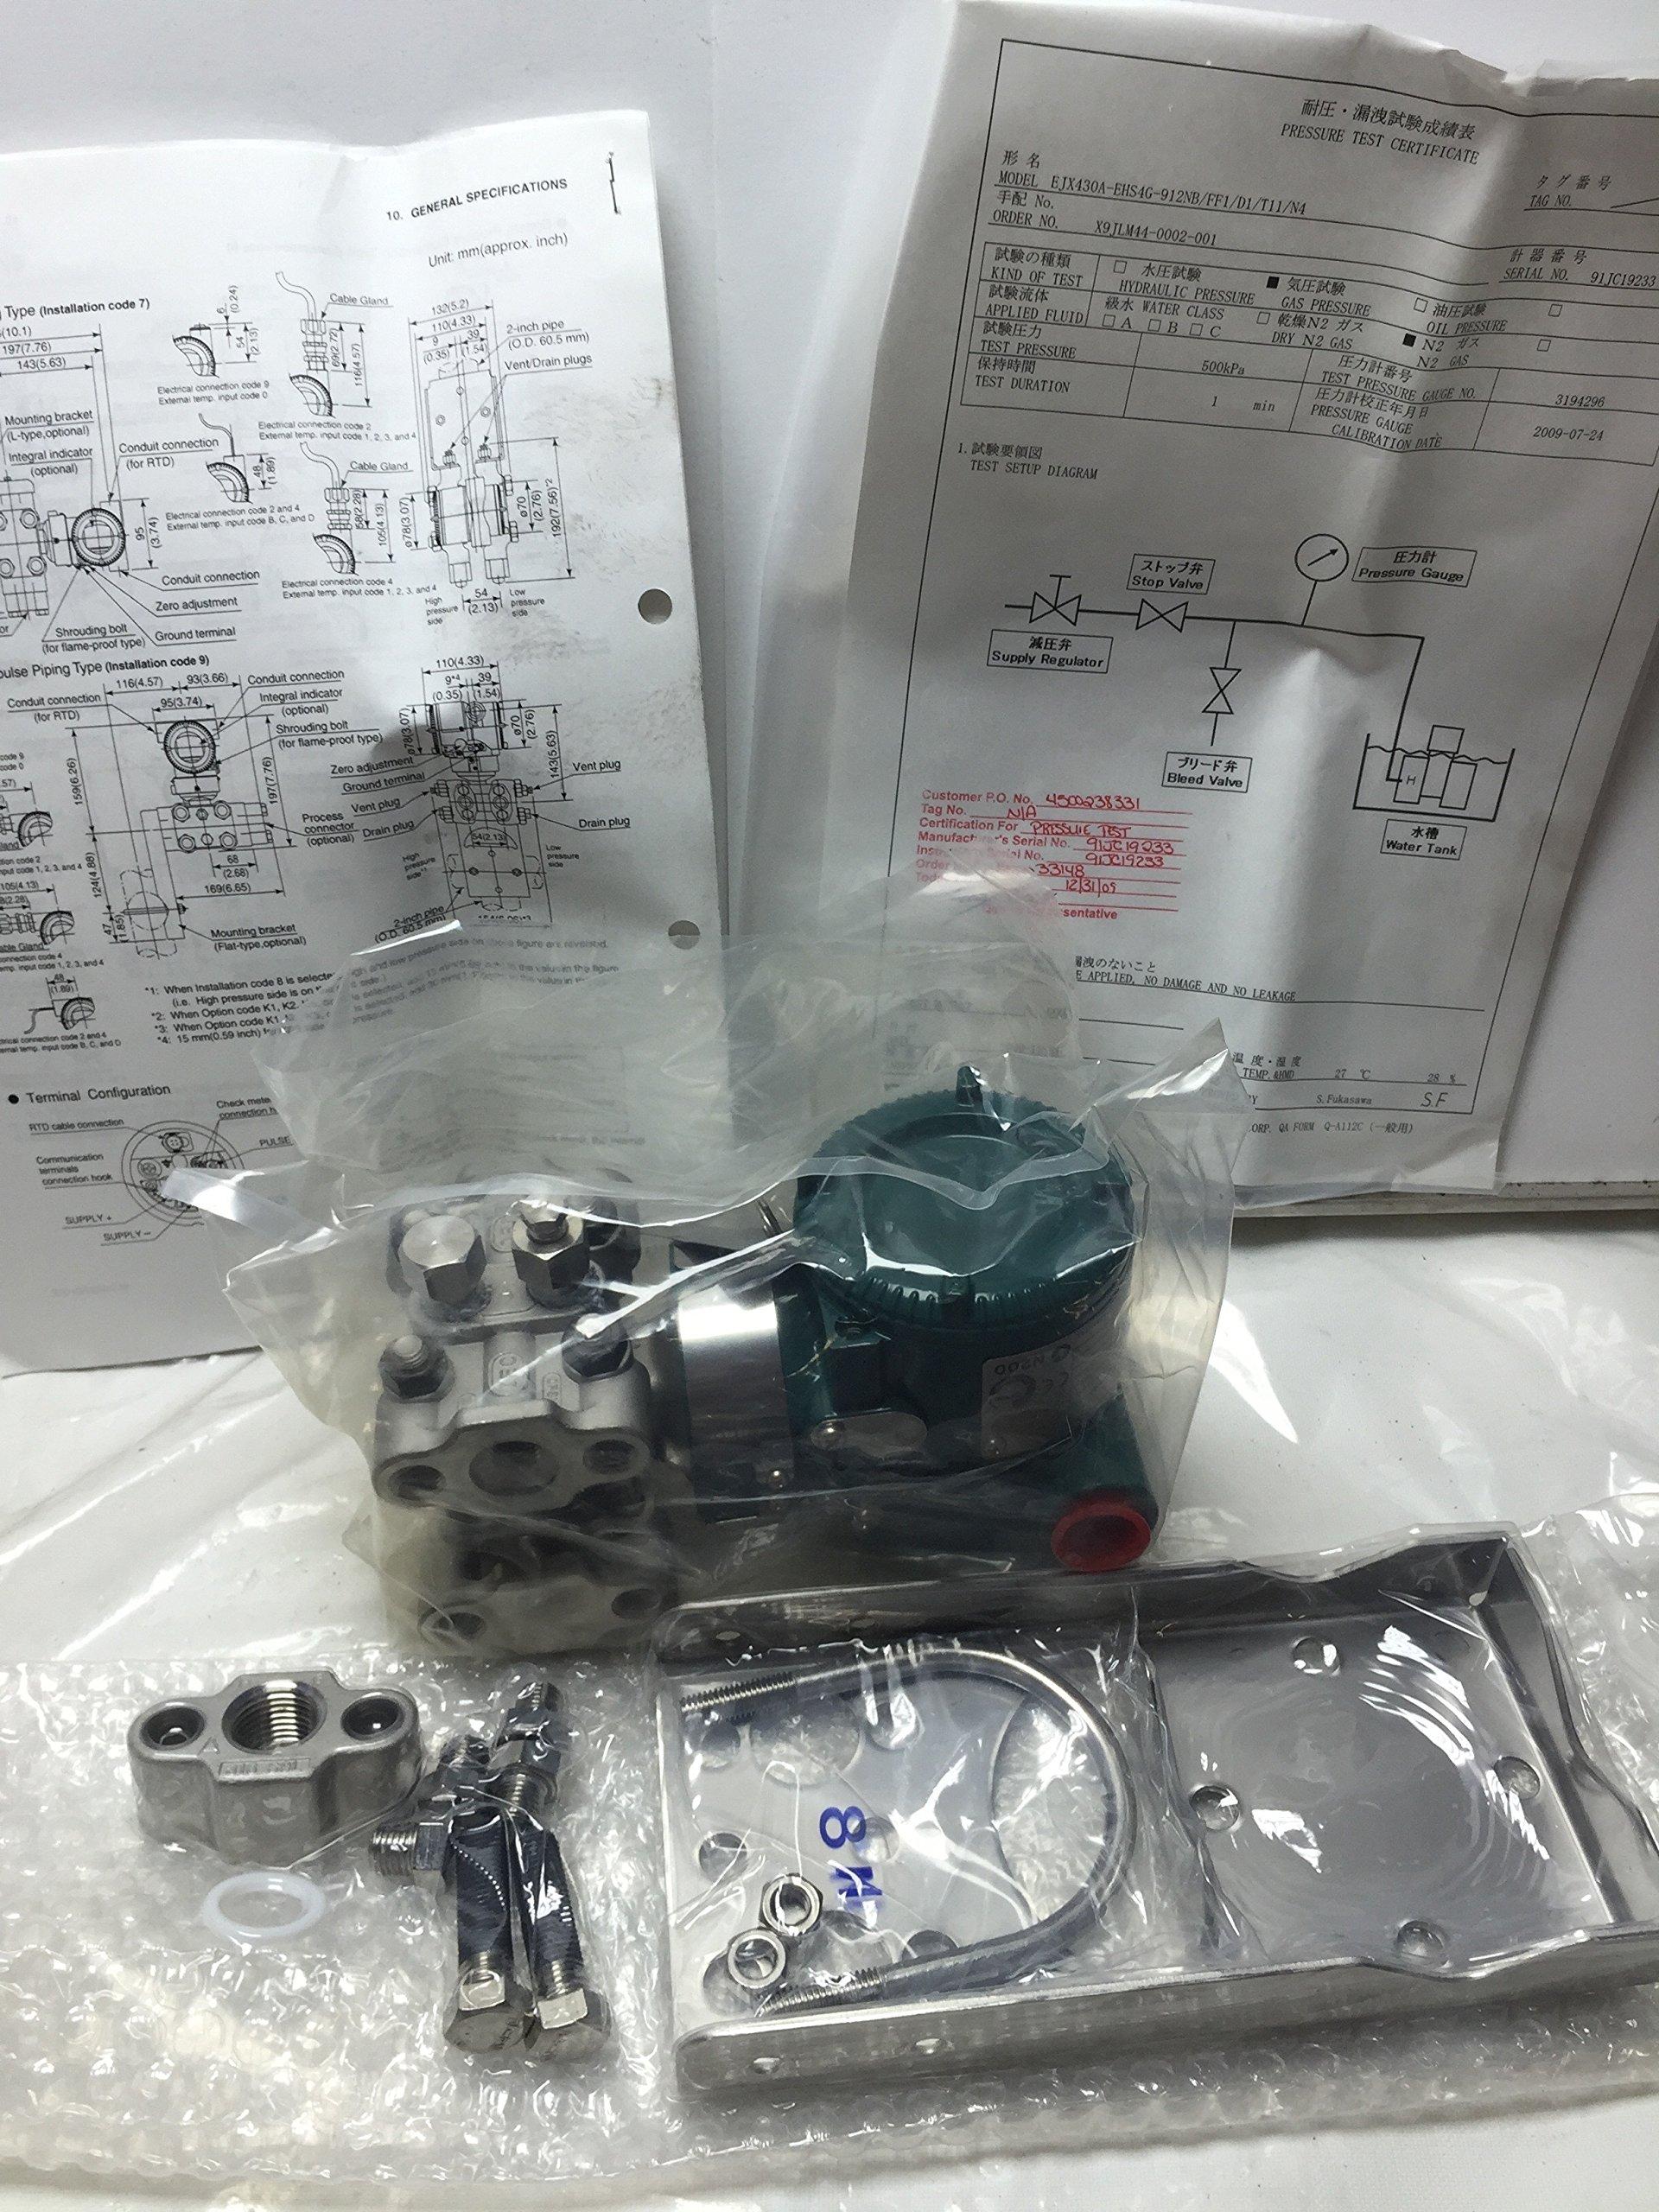 Ejx430A-Ehs4G-912Nb/Ff1/D1/T11/N4 Pressure Transmitter